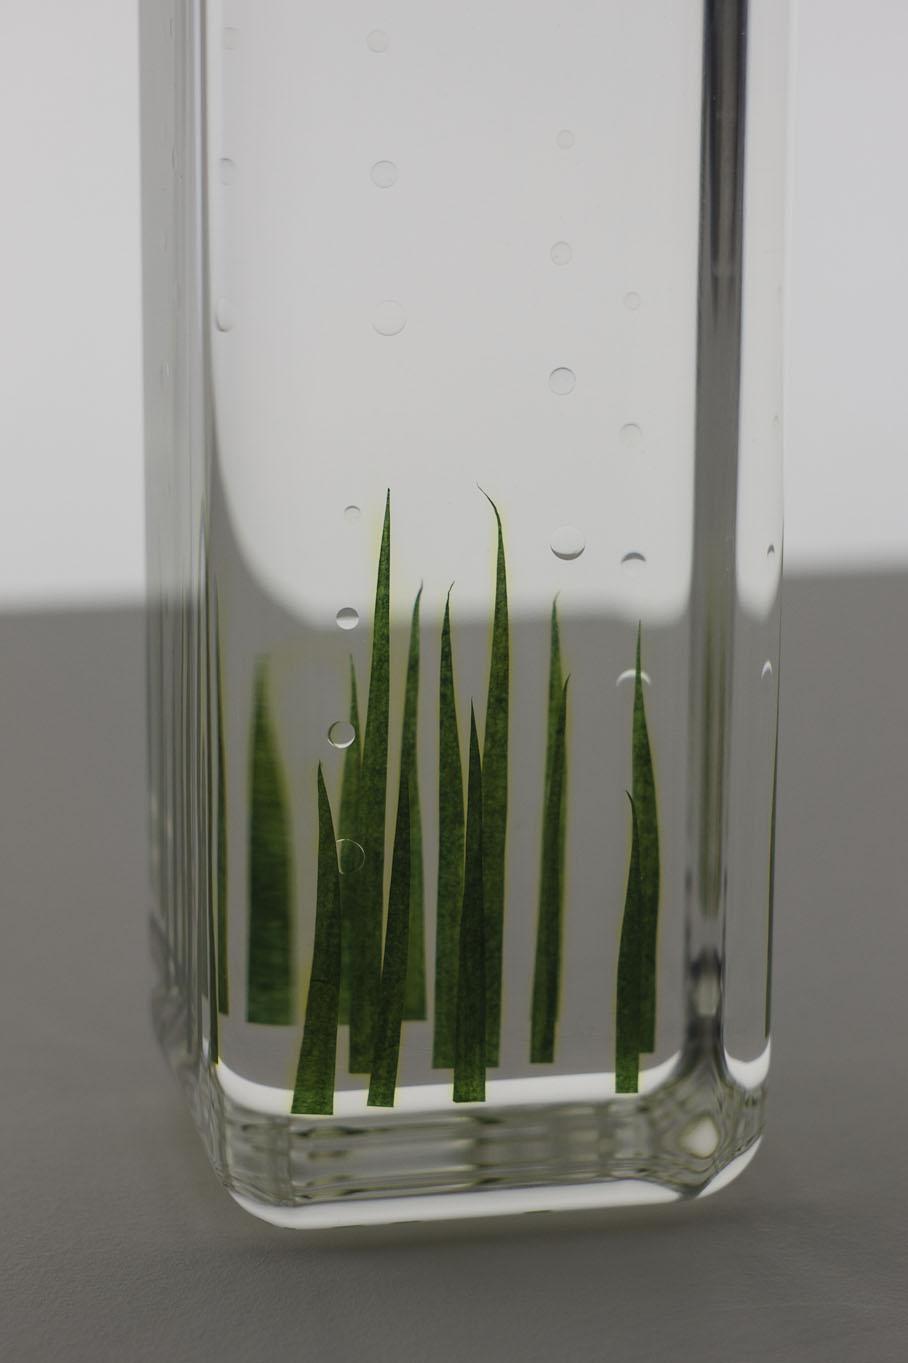 Samidare (pluie de printemps)  Rain Bottle by Nendo  Words, Elizabeth Leriche - Sharing